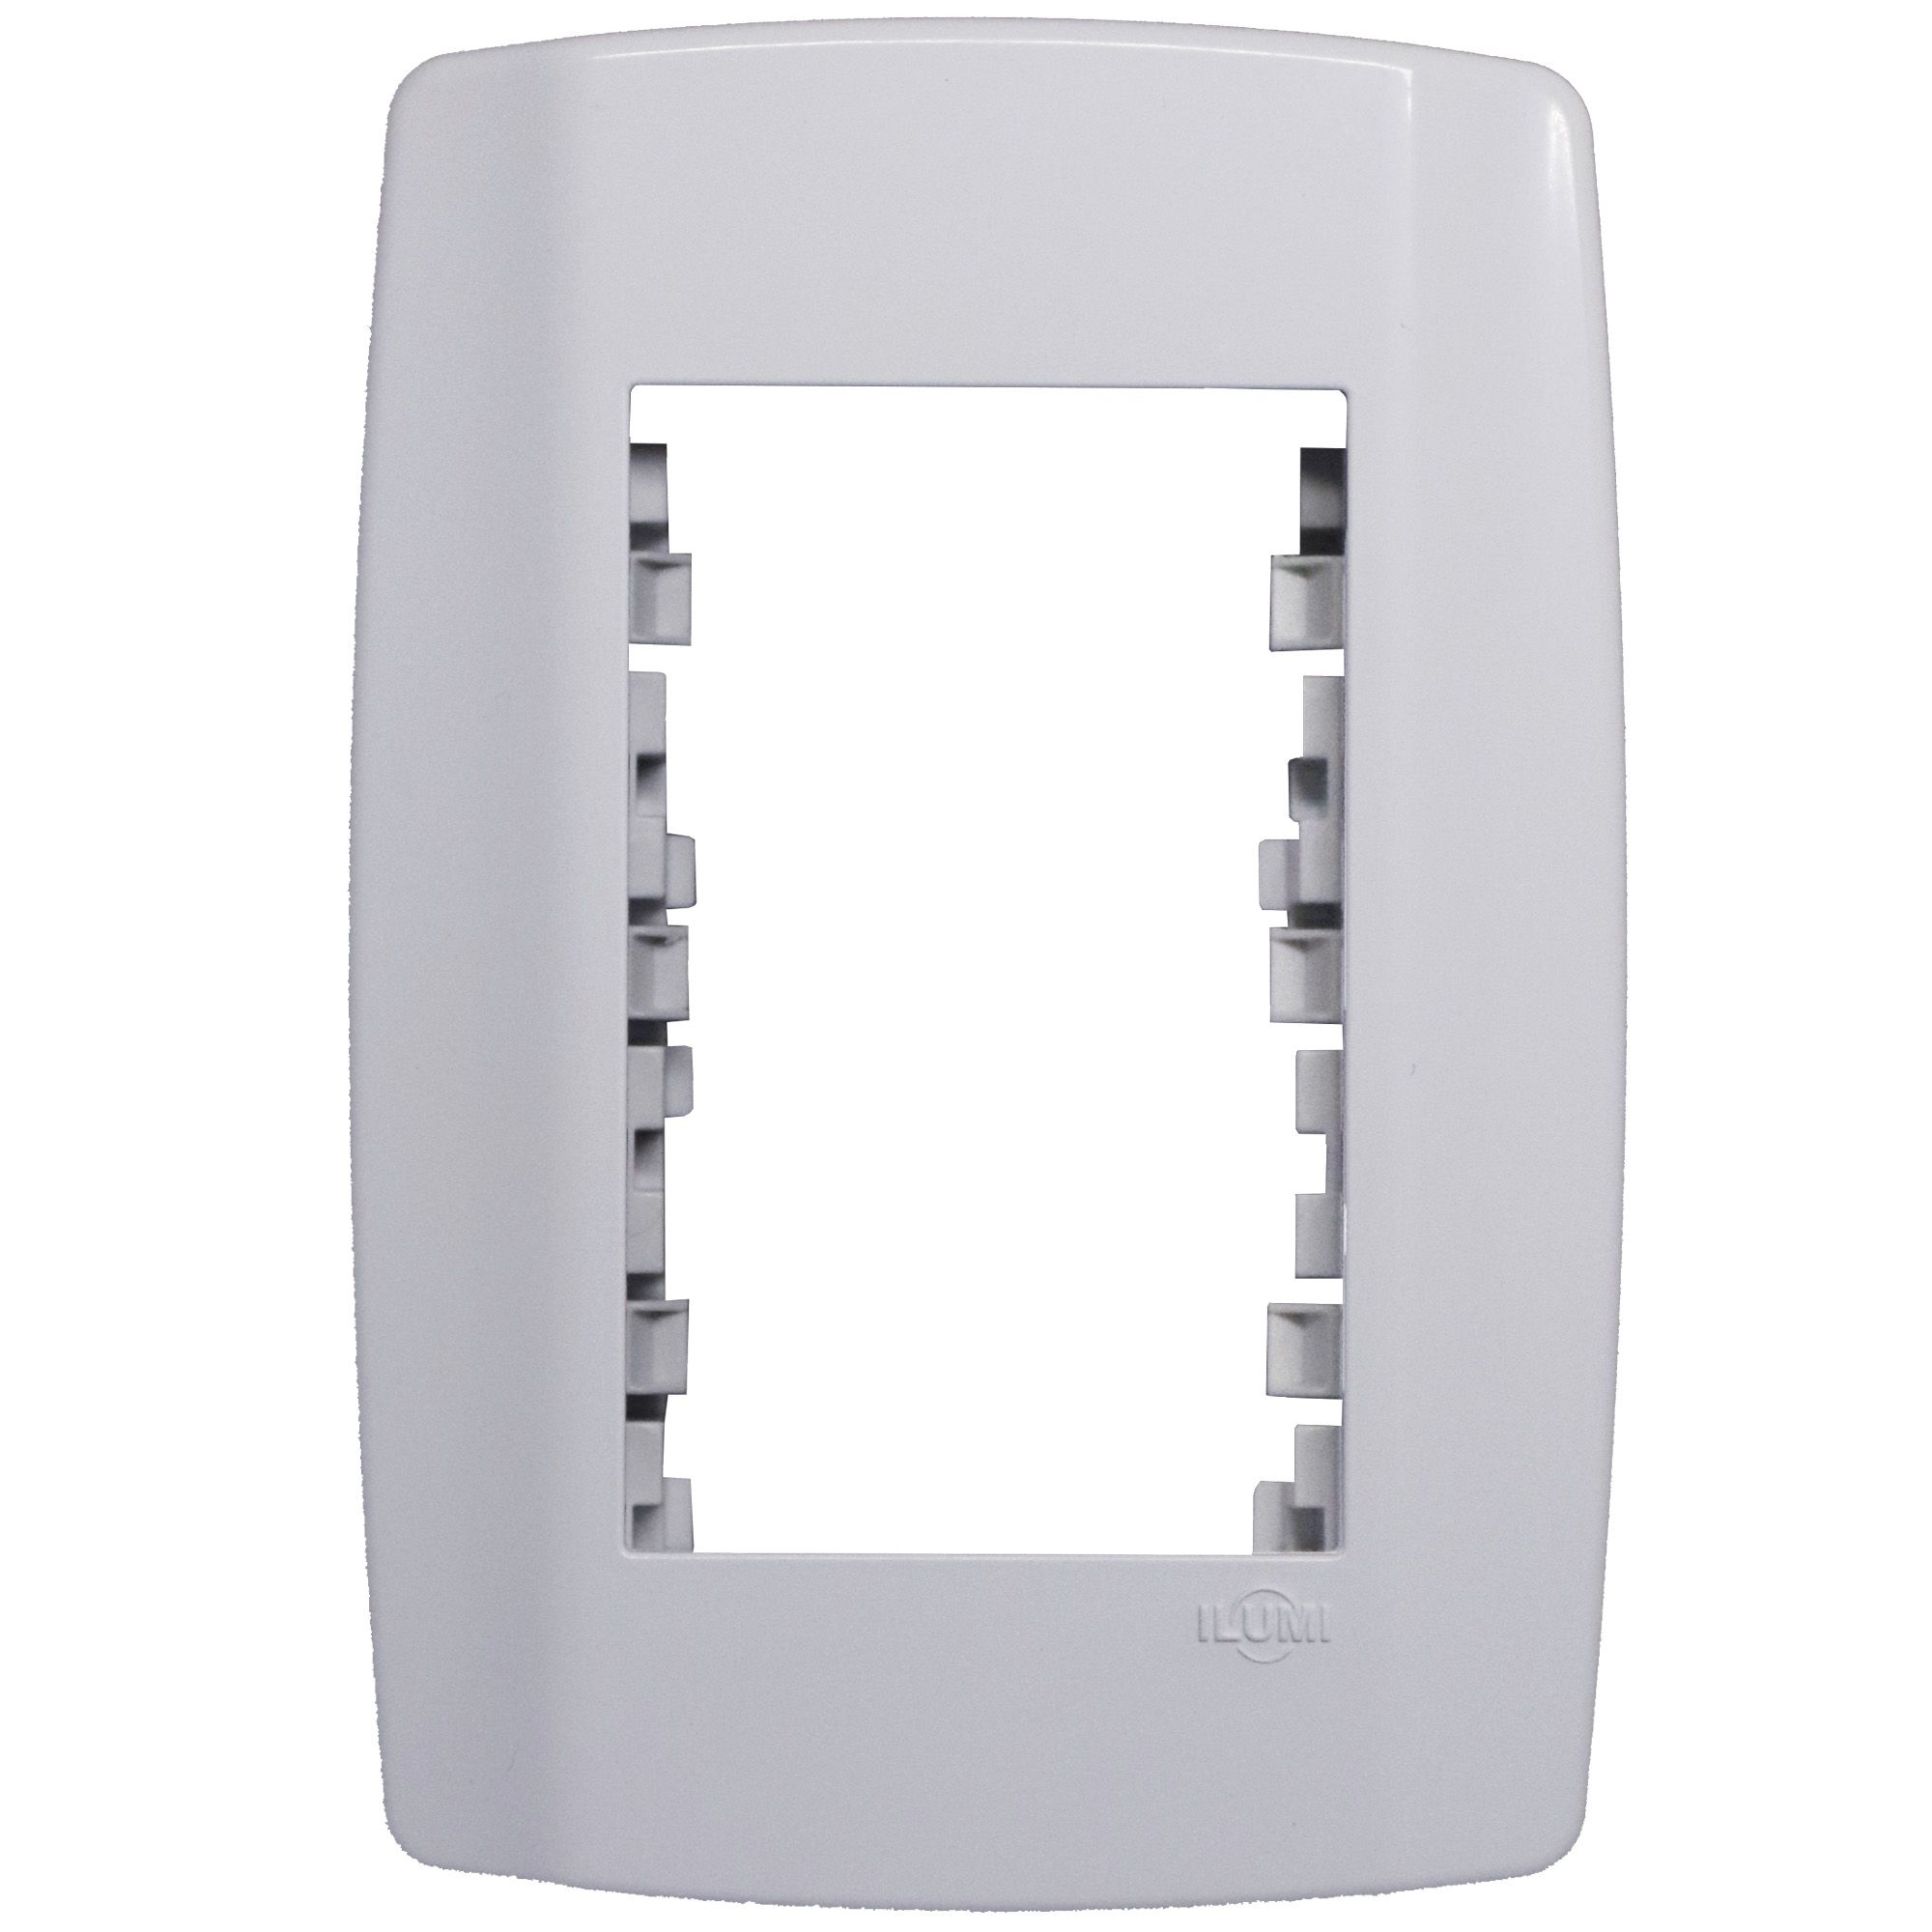 Cj 4x2 Interruptor Simples Módulo Cego Tomada 10a Ilumi Slim